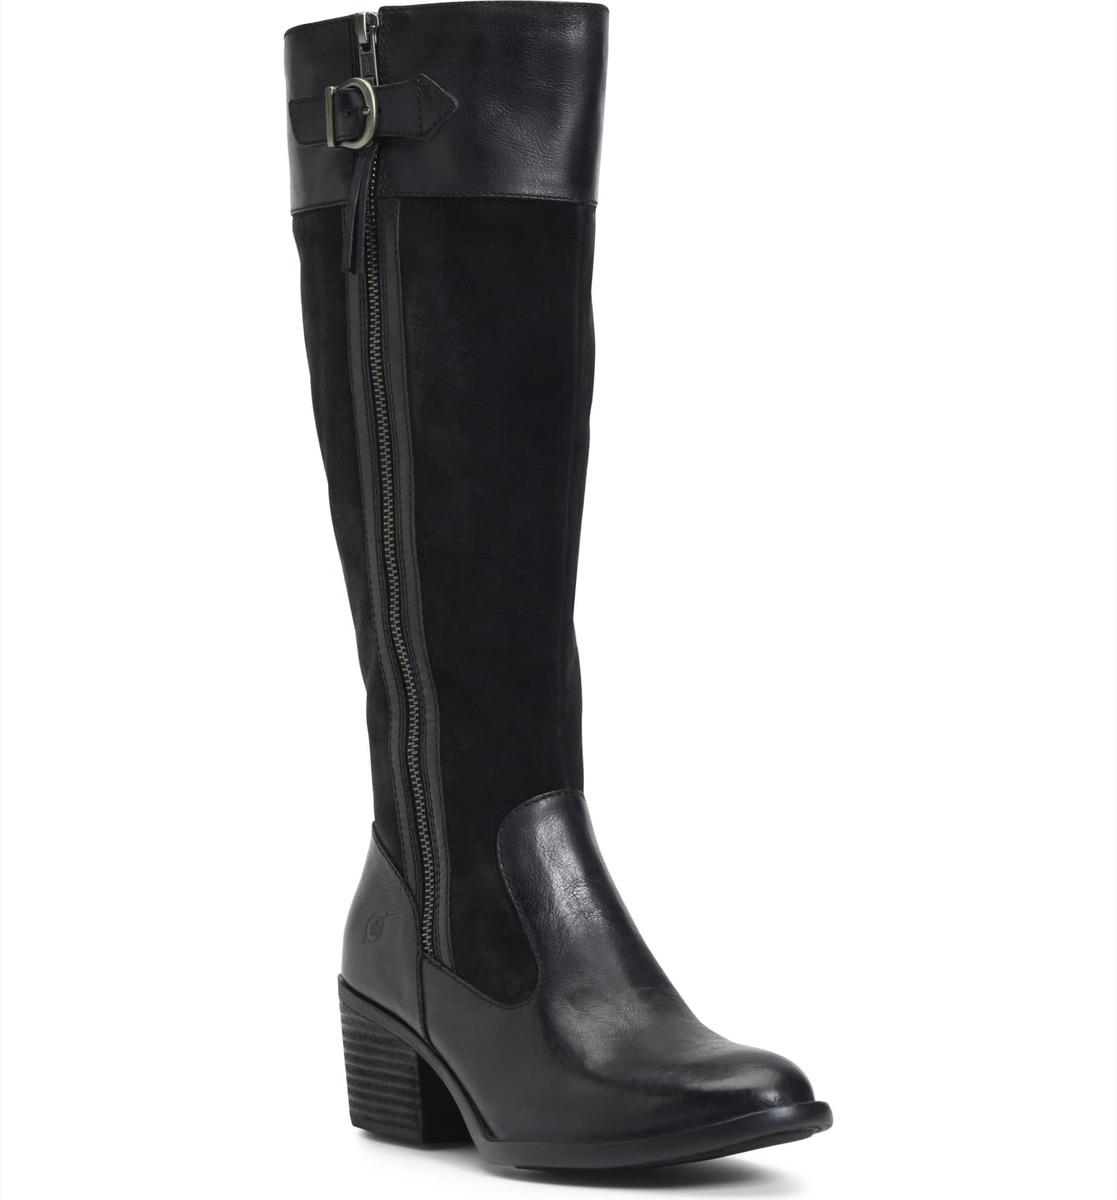 black knee high boots, Nordstrom anniversary sale